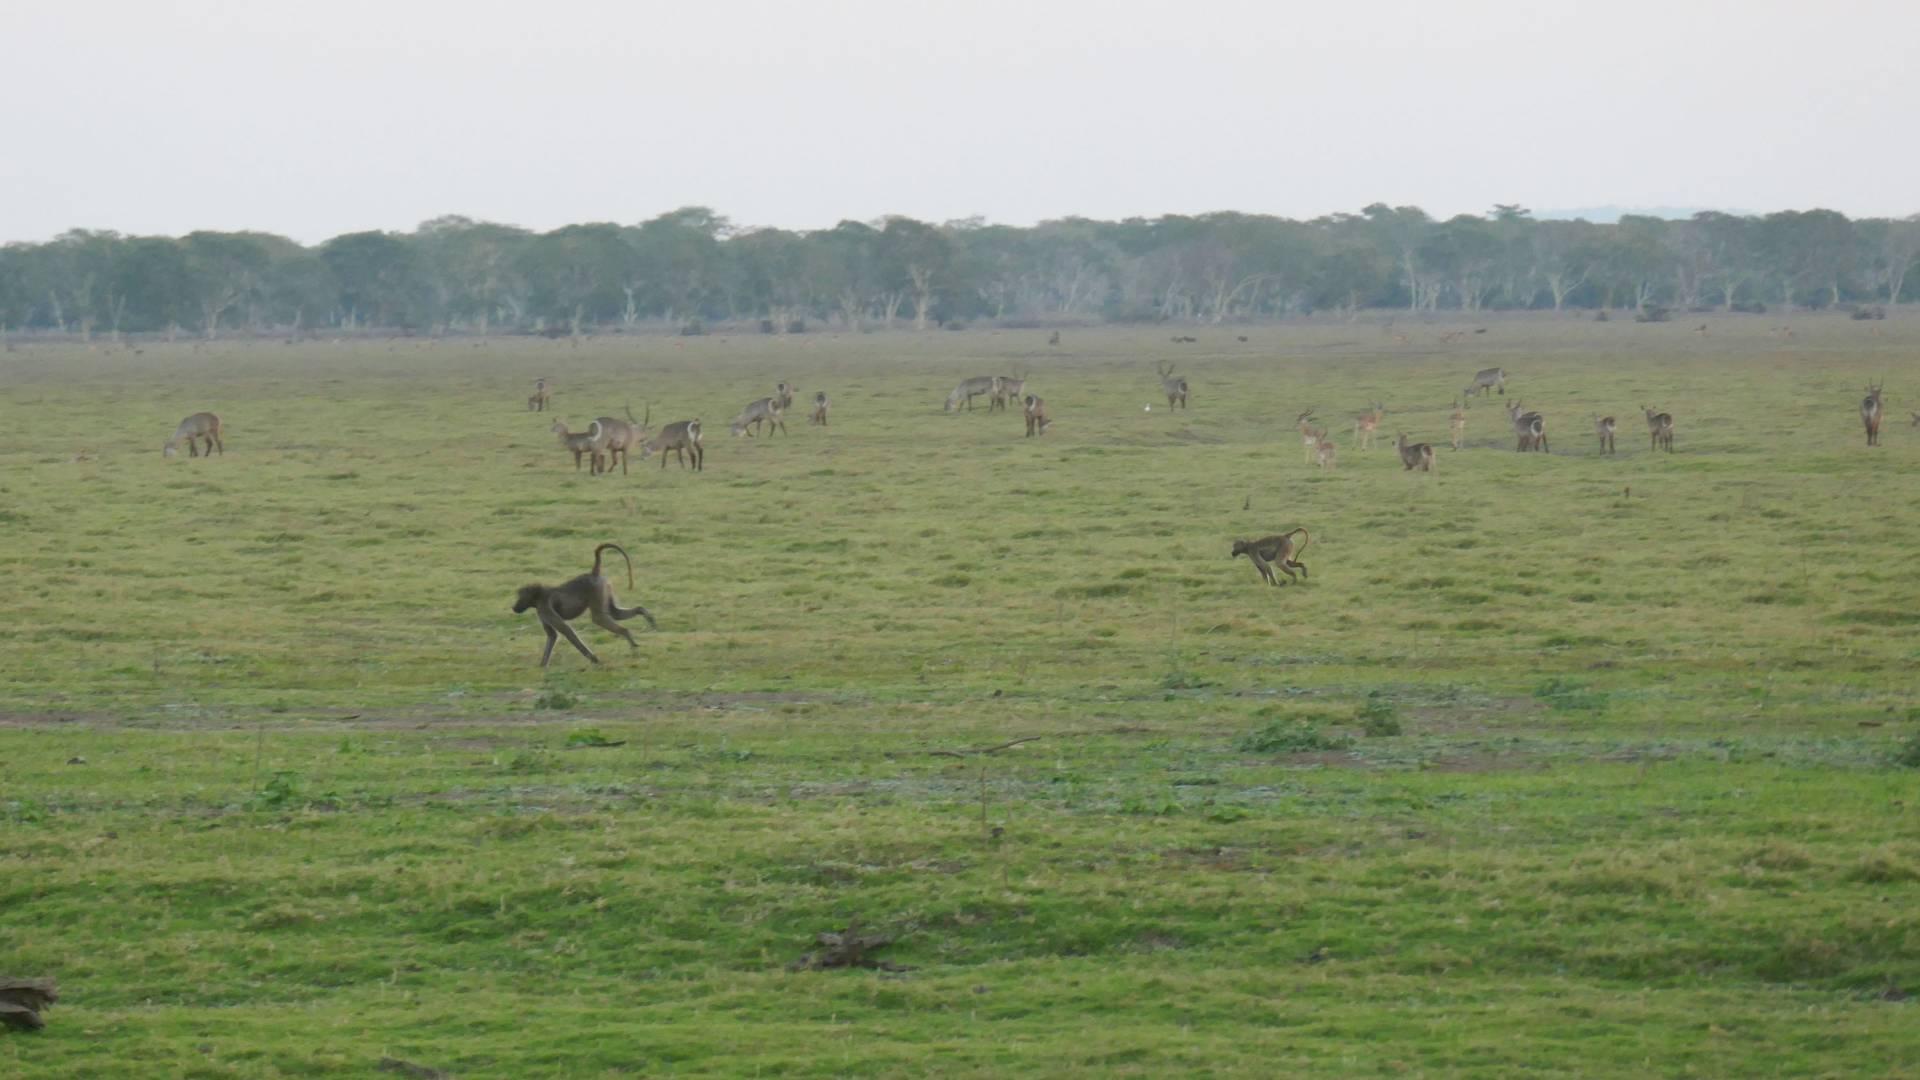 Baboons rub across a field